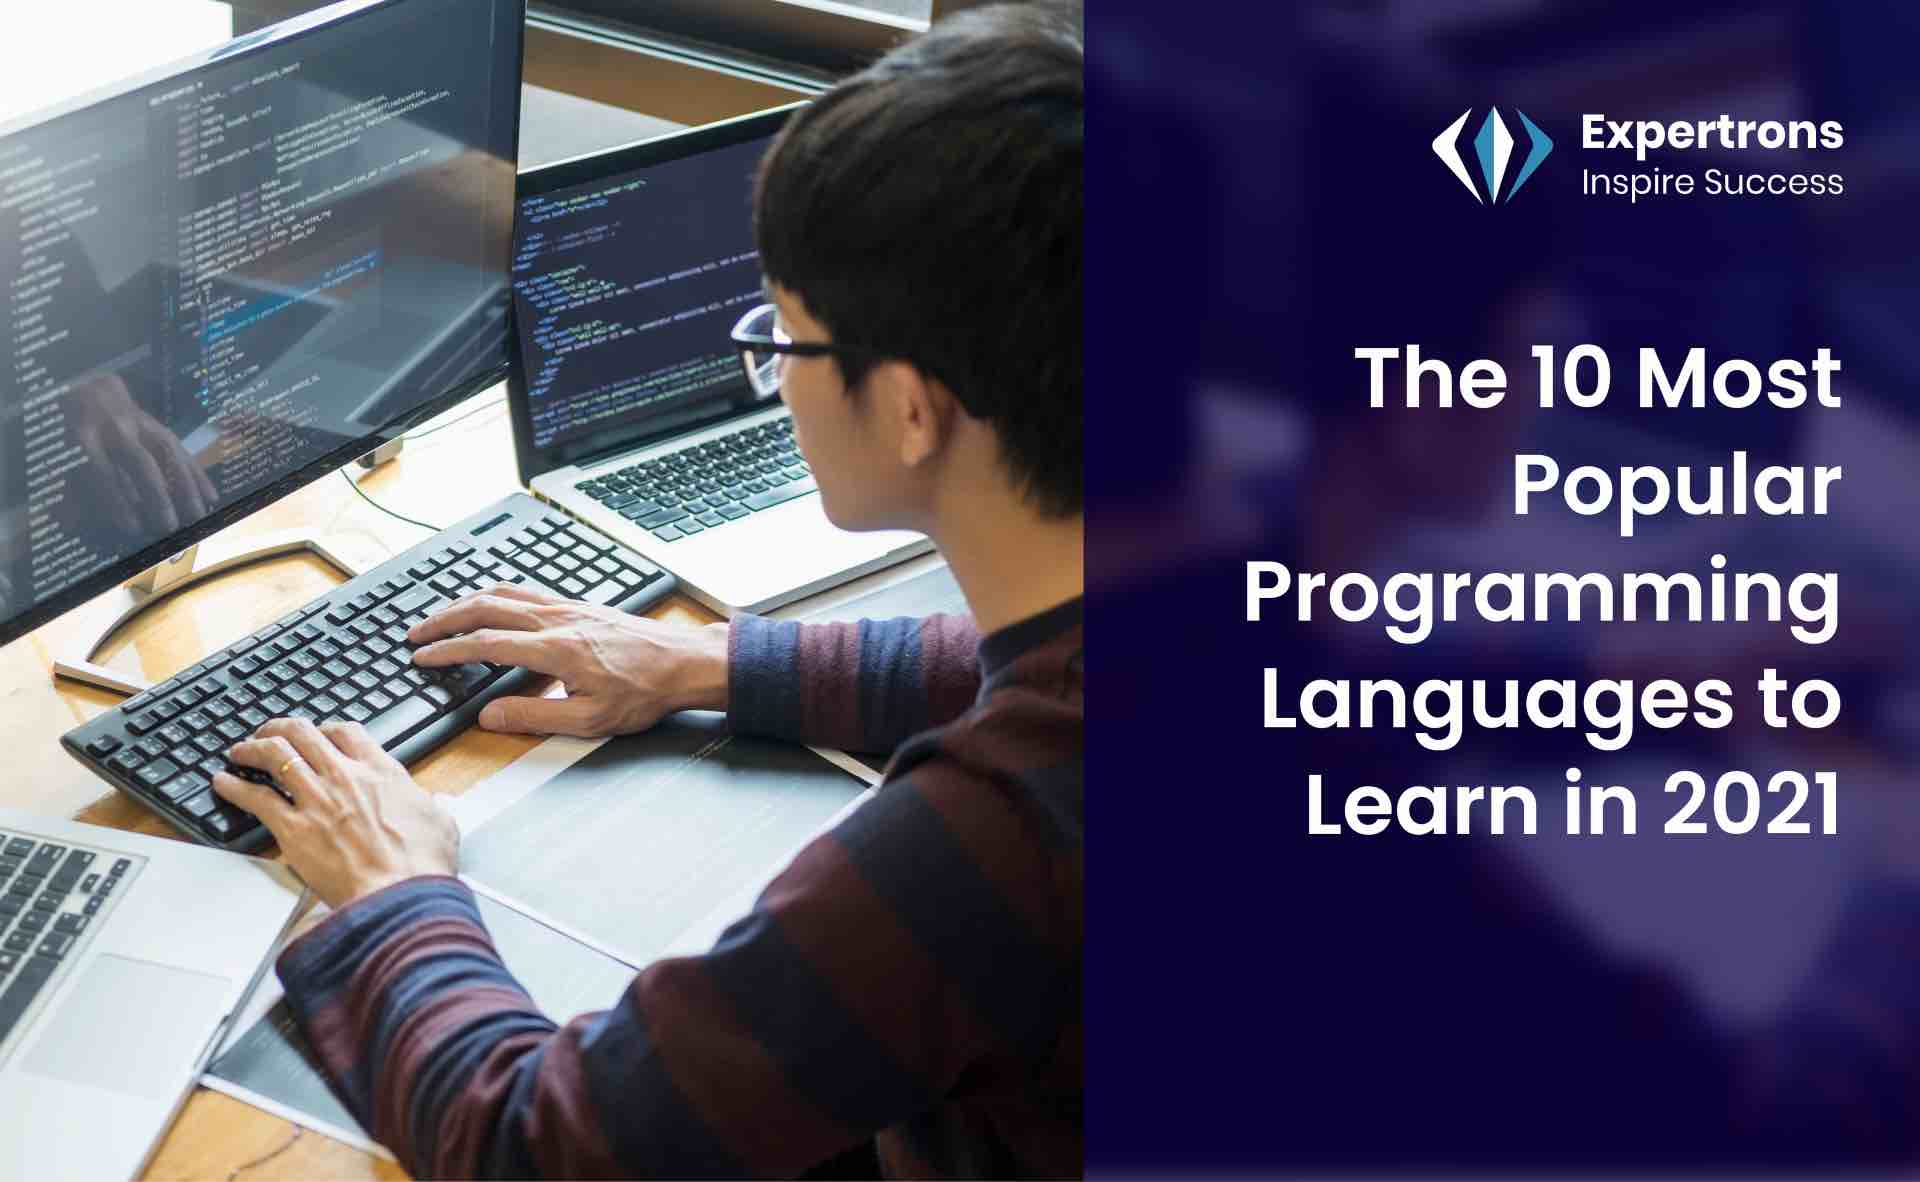 most popular programming languages, best programming language to learn, easiest programming language to learn, the swift programming language, most in demand programming languages, most popular programming languages